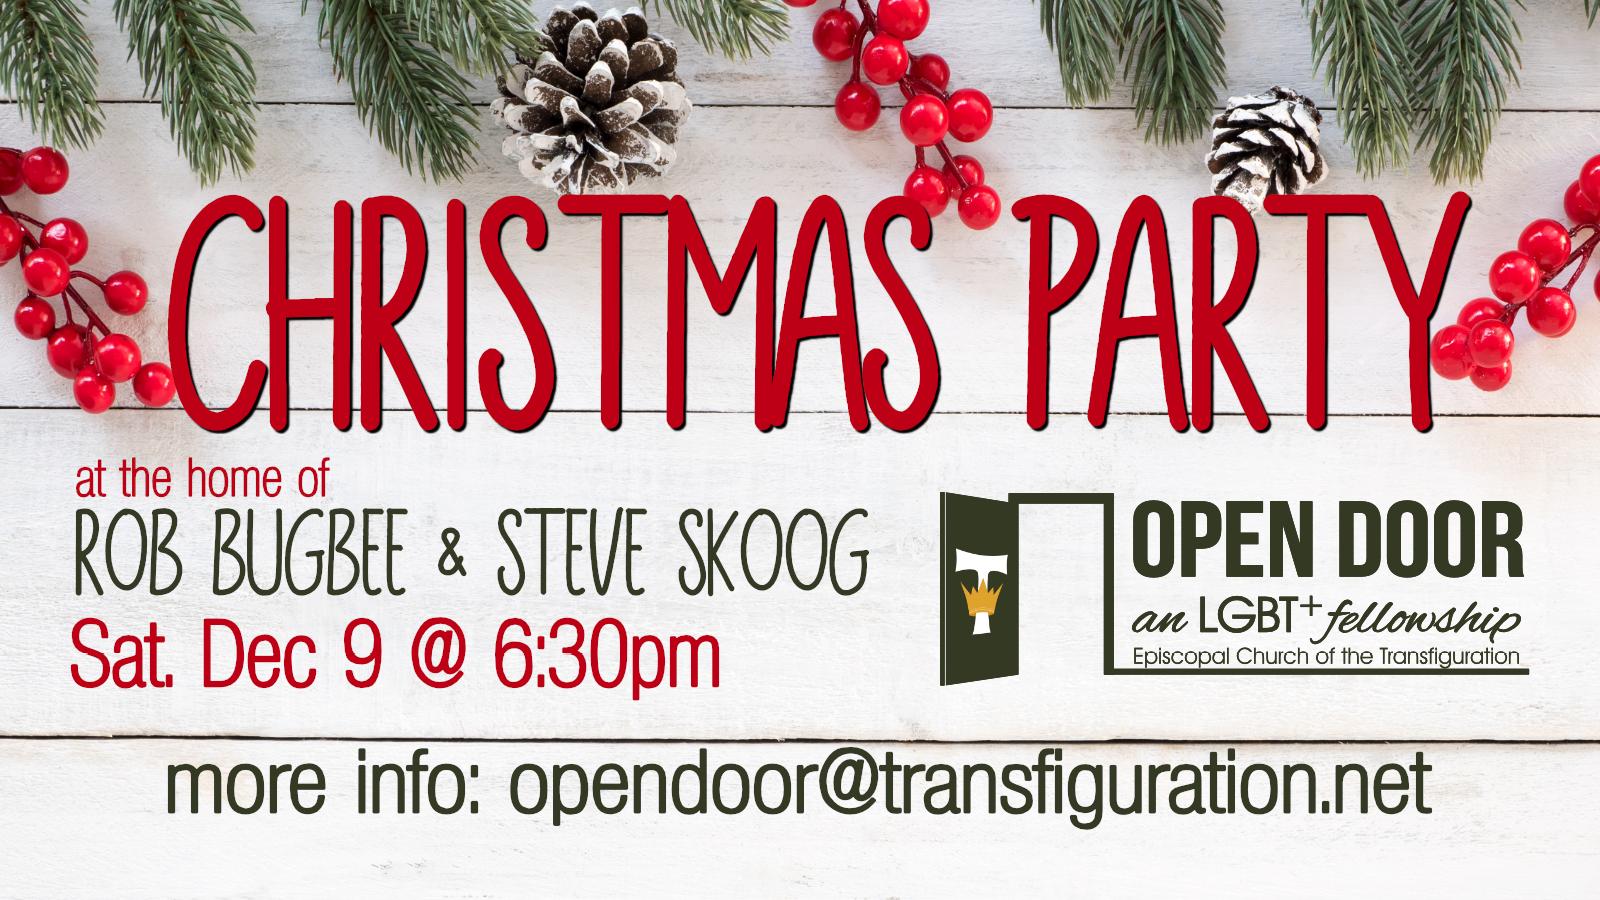 Open Door Fellowship Christmas Party  sc 1 st  Episcopal Church of the Transfiguration & Open Door Fellowship Christmas Party \u2013 Episcopal Church of the ...